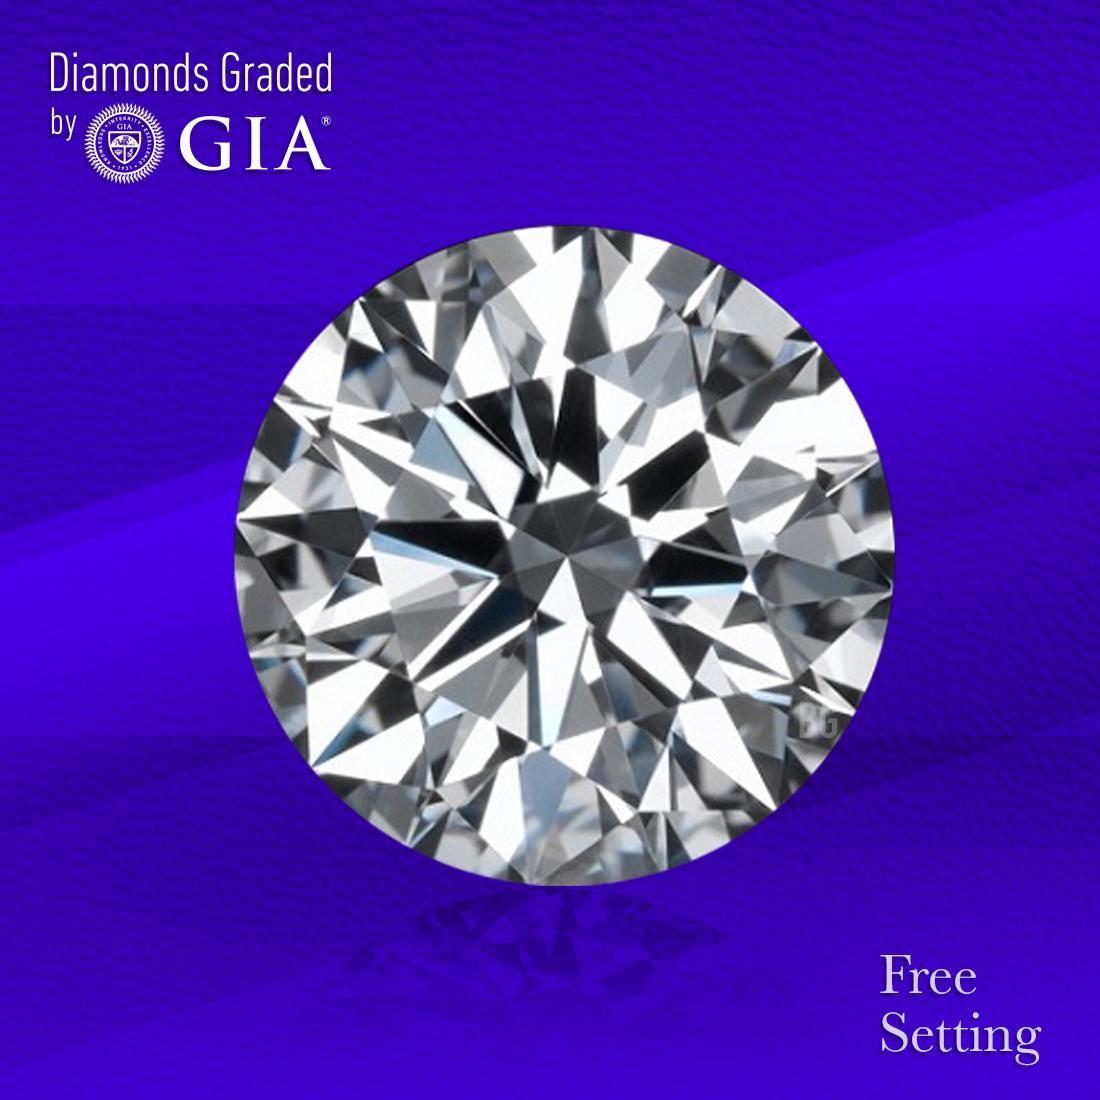 2.50 ct, Color D/VS2, Round cut GIA Graded Diamond